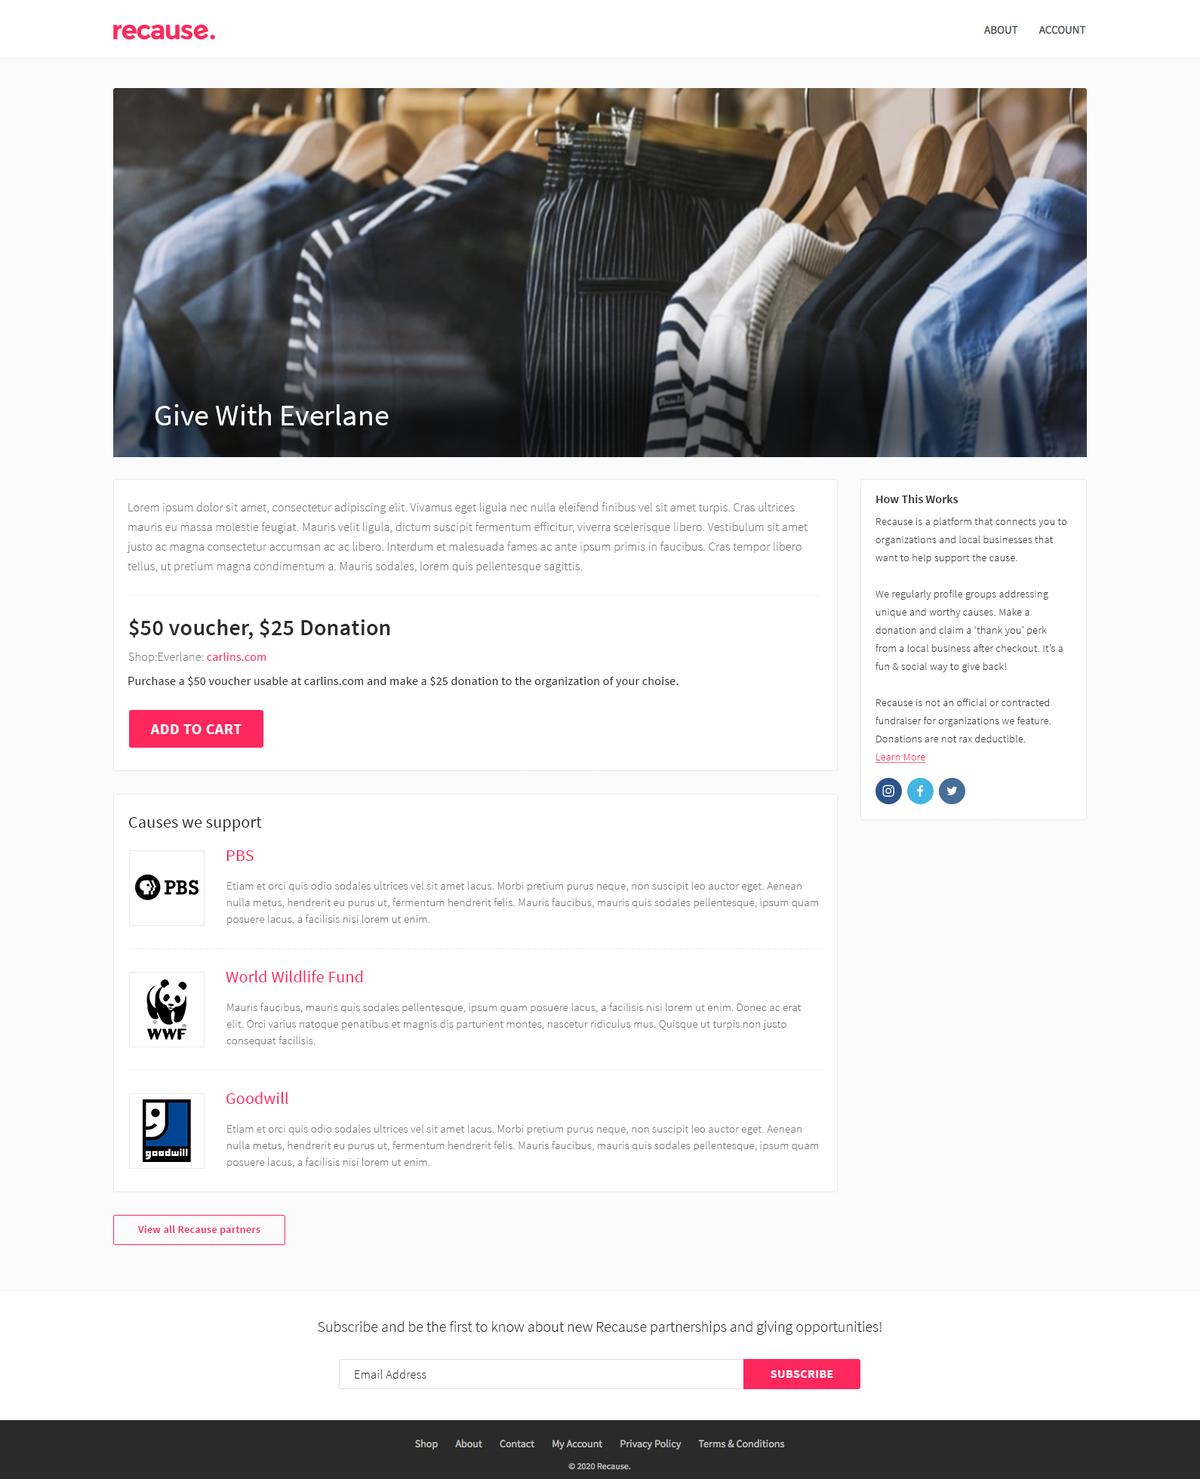 Recause - page layout